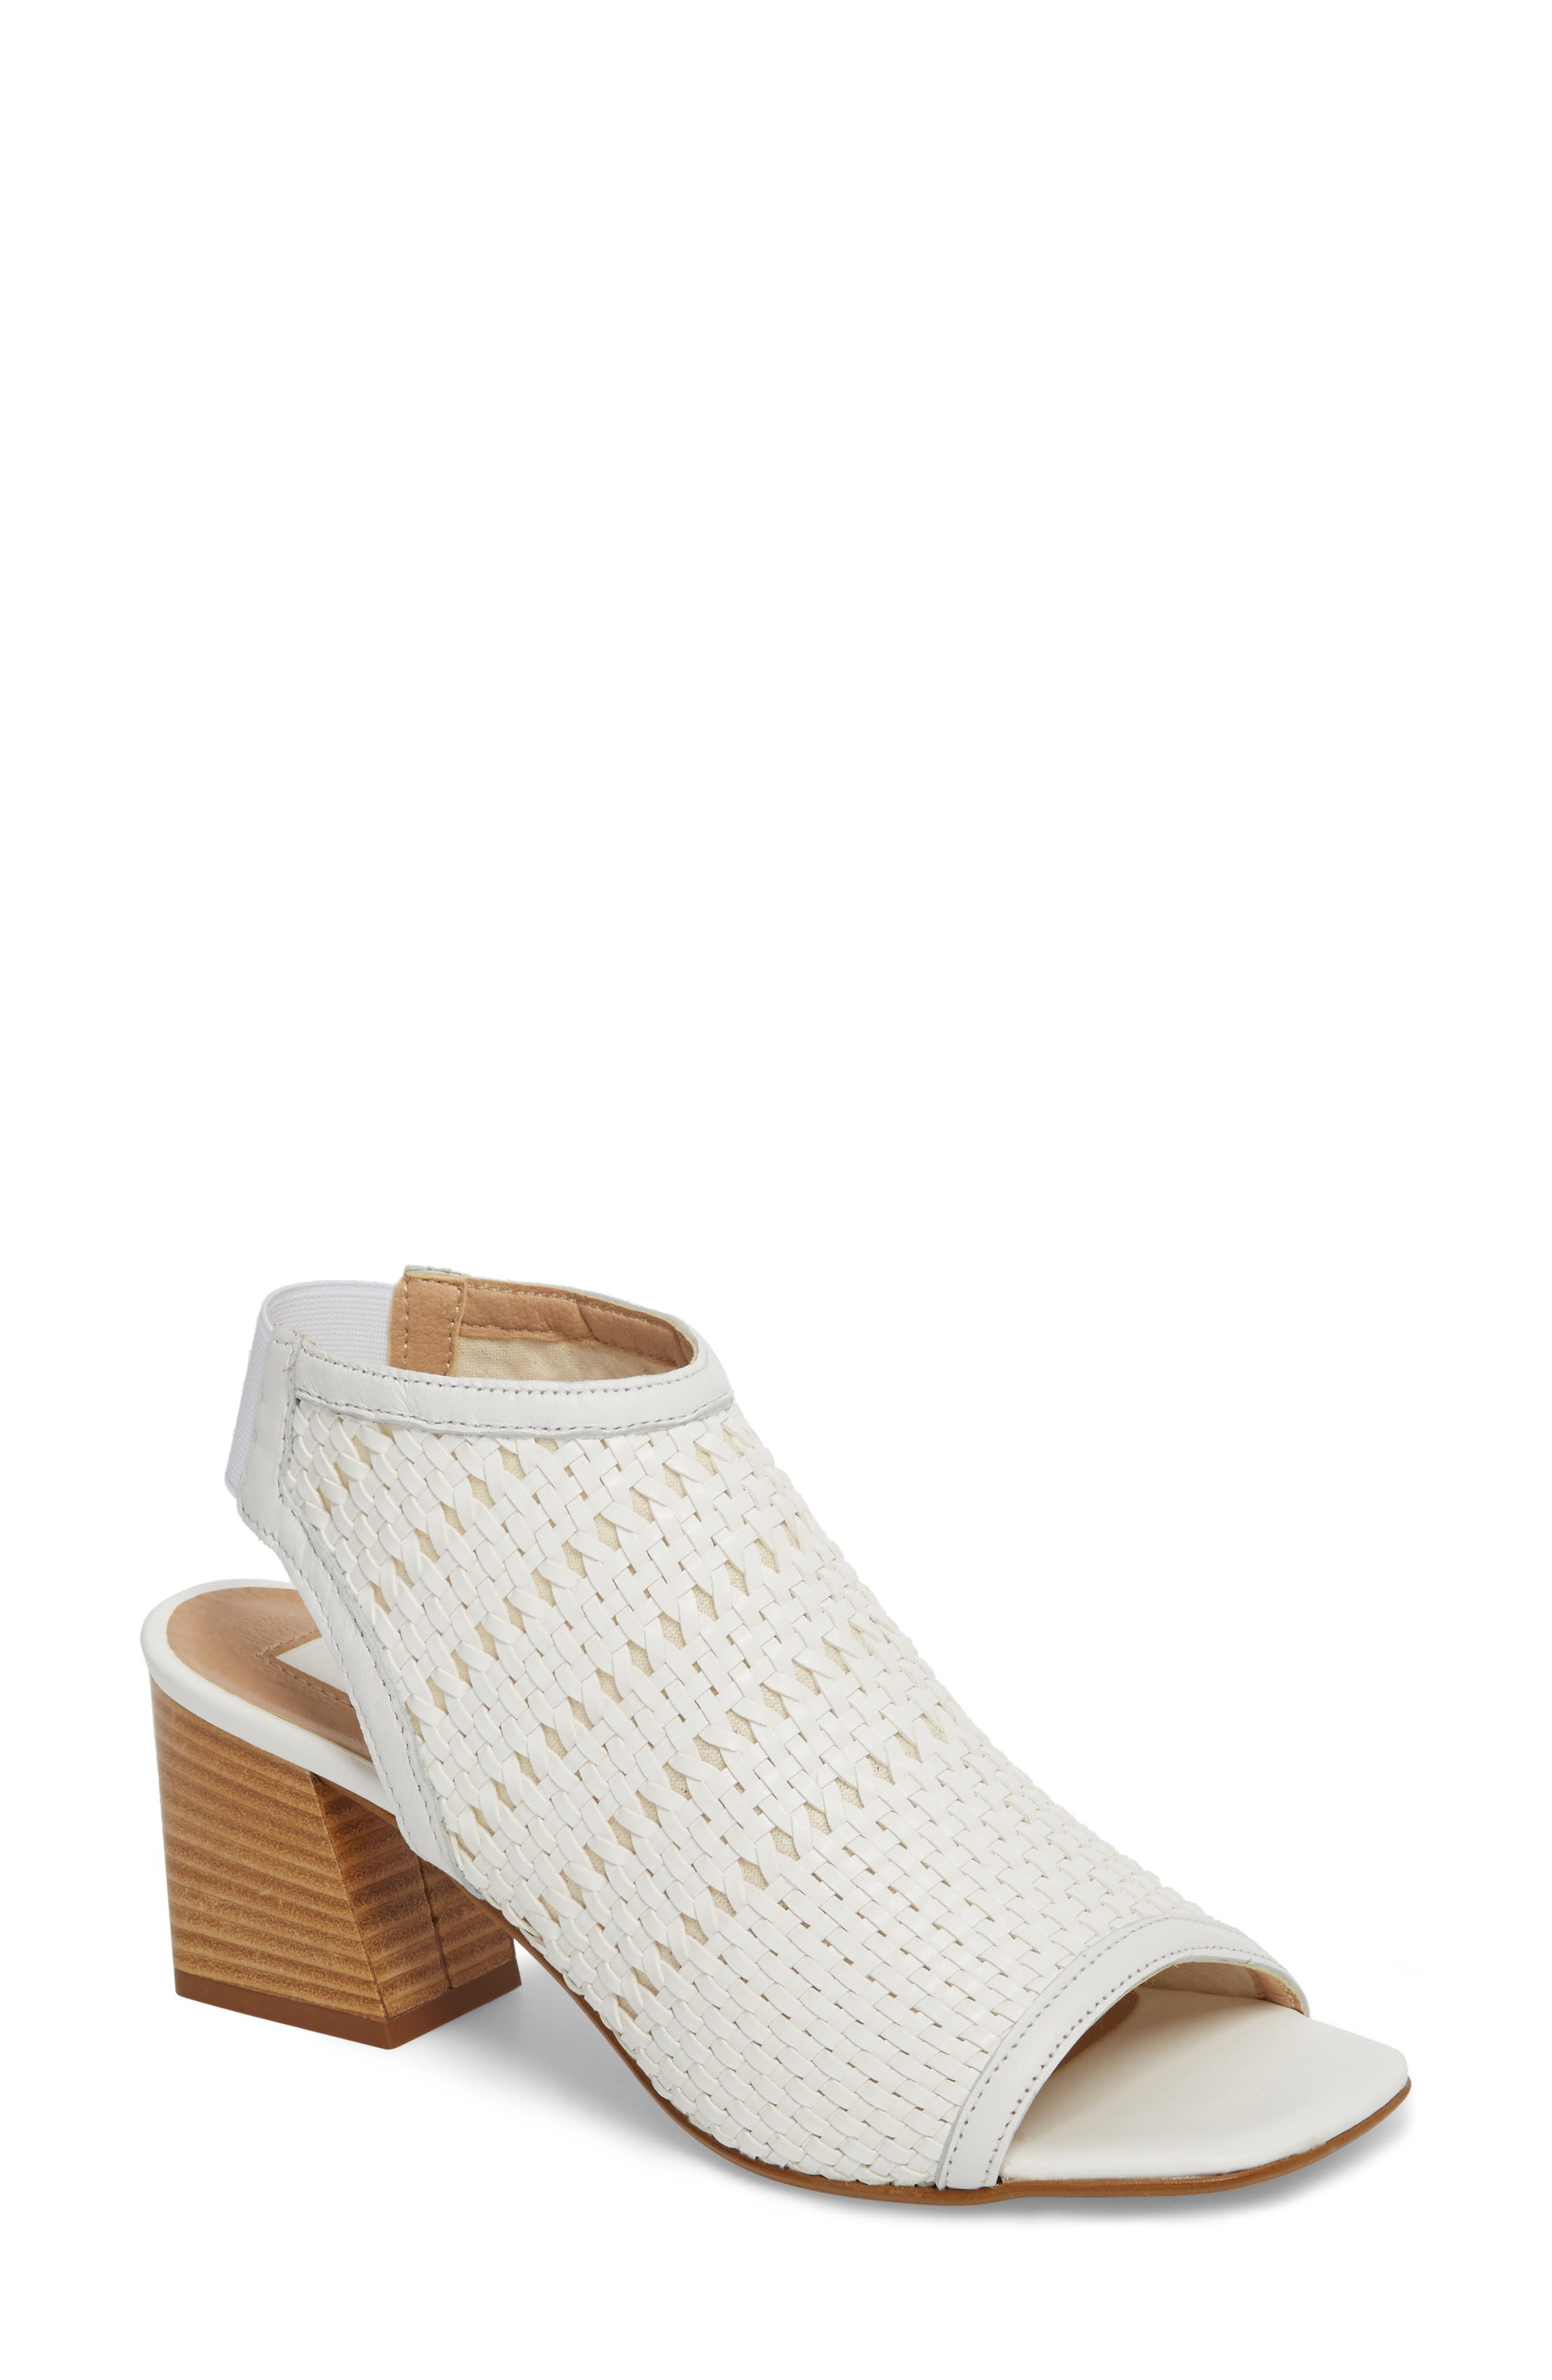 Topshop Women's Nifty Woven Flared Heel Sandal sxrGC58YwS